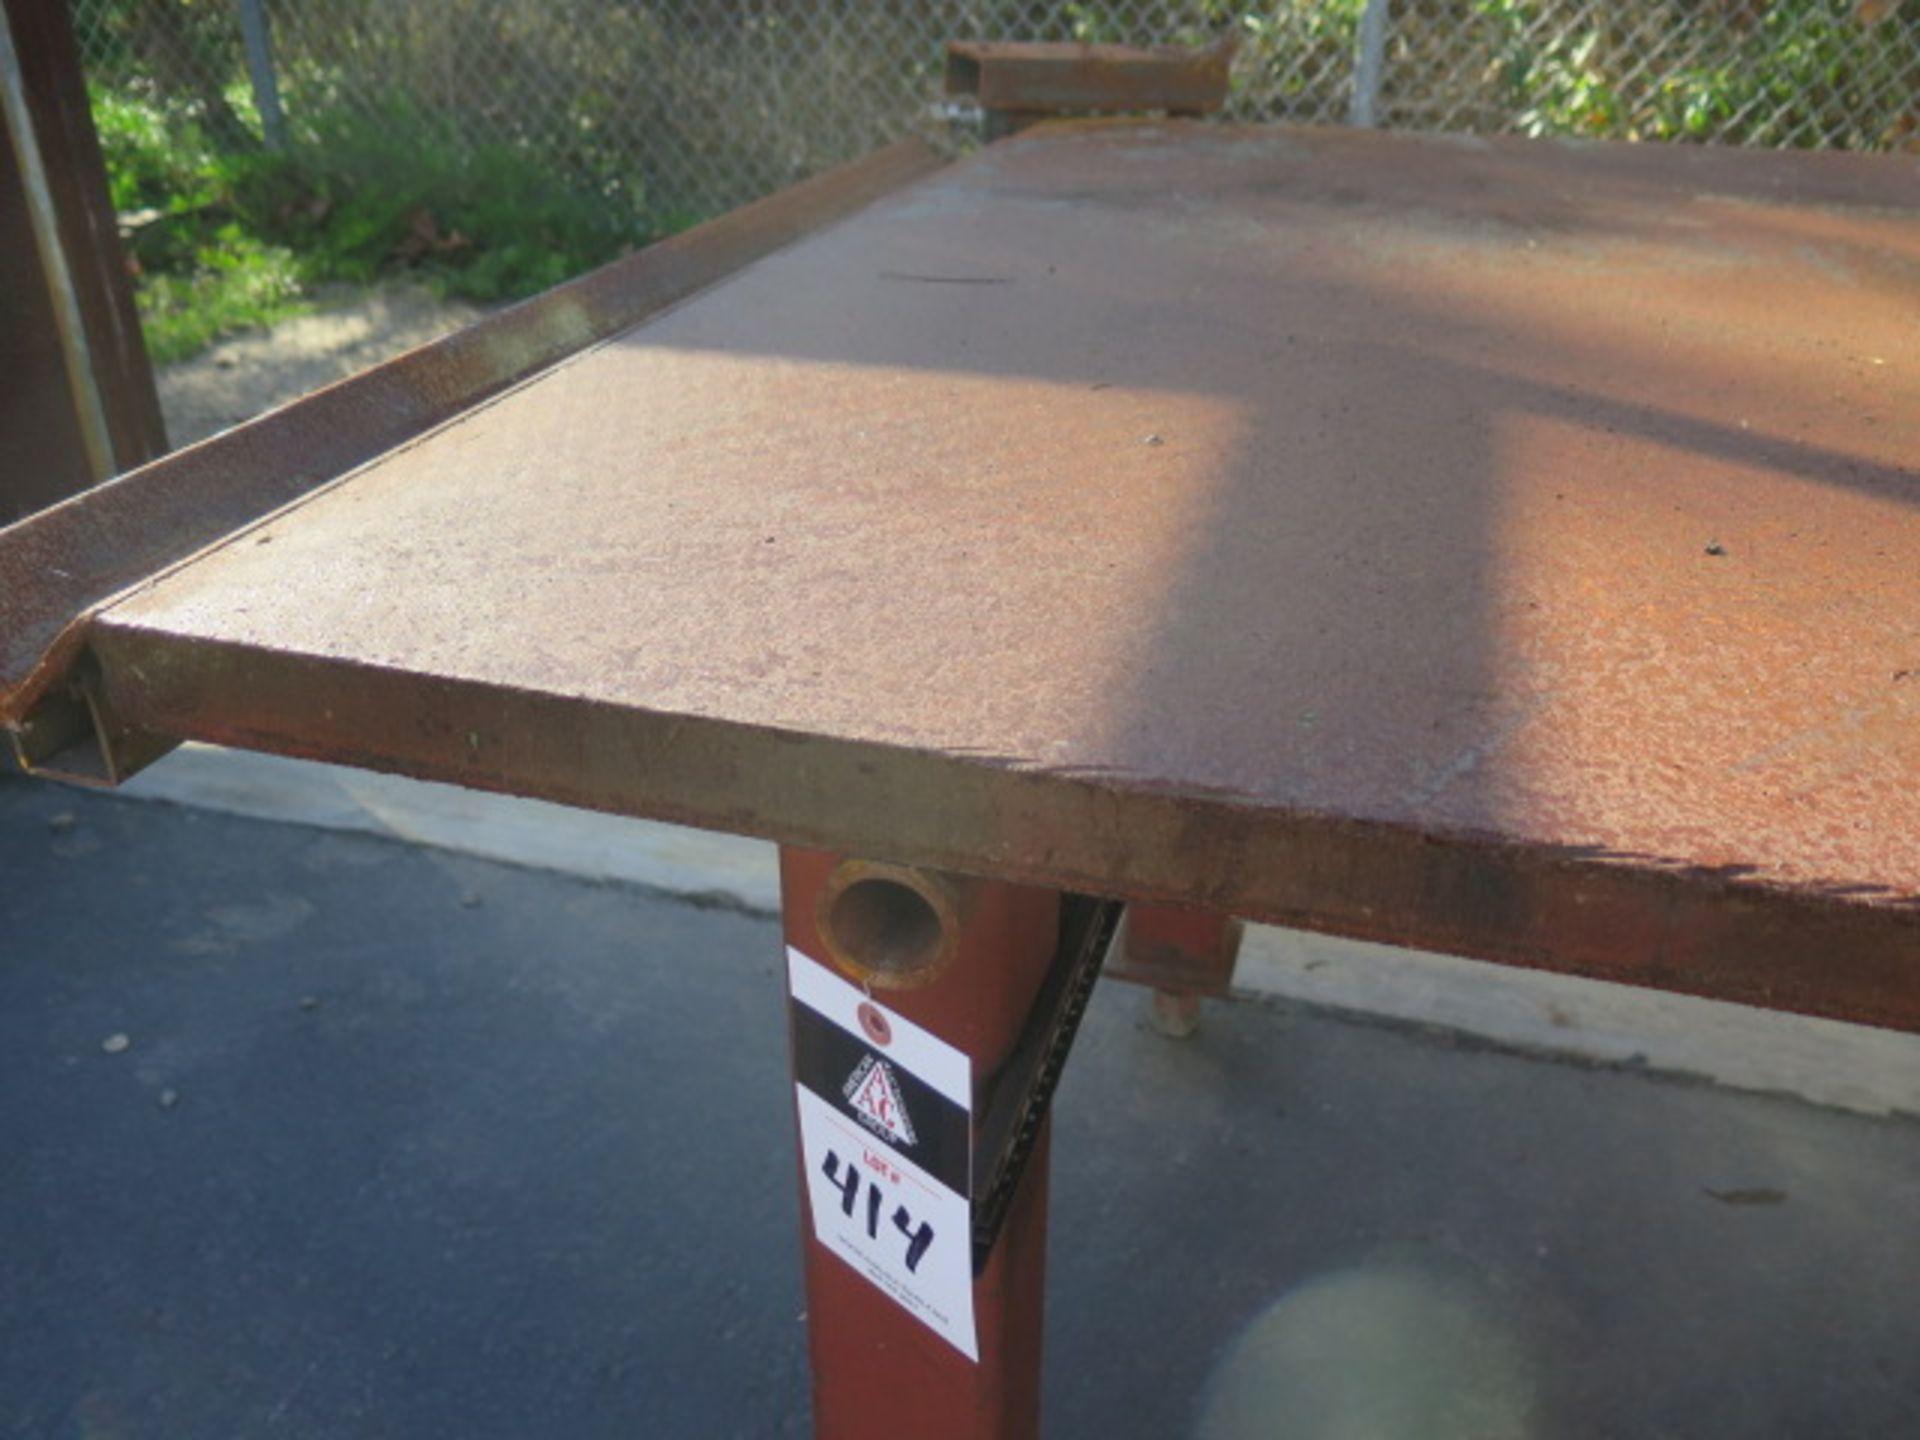 "4' x 8' x 1 1/2"" Steel Welding Table (SOLD AS-IS - NO WARRANTY) - Image 3 of 5"